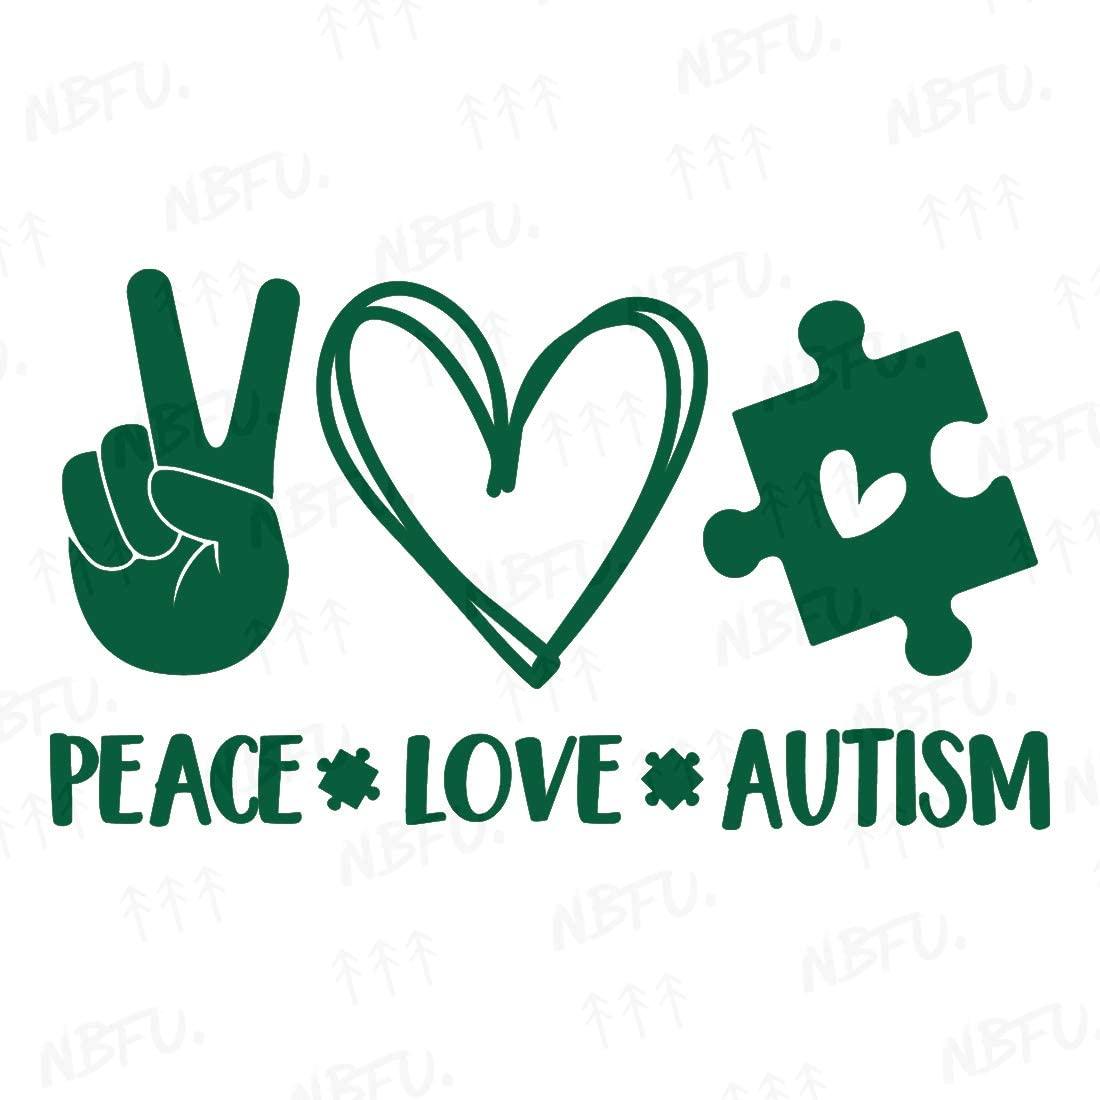 NBFU Decals Peace Love Autism Puzzle Heart 1 (Green) (Set of 2) Premium Waterproof Vinyl Decal Stickers for Laptop Phone Accessory Helmet Car Window Bumper Mug Tuber Cup Door Wall Decoration